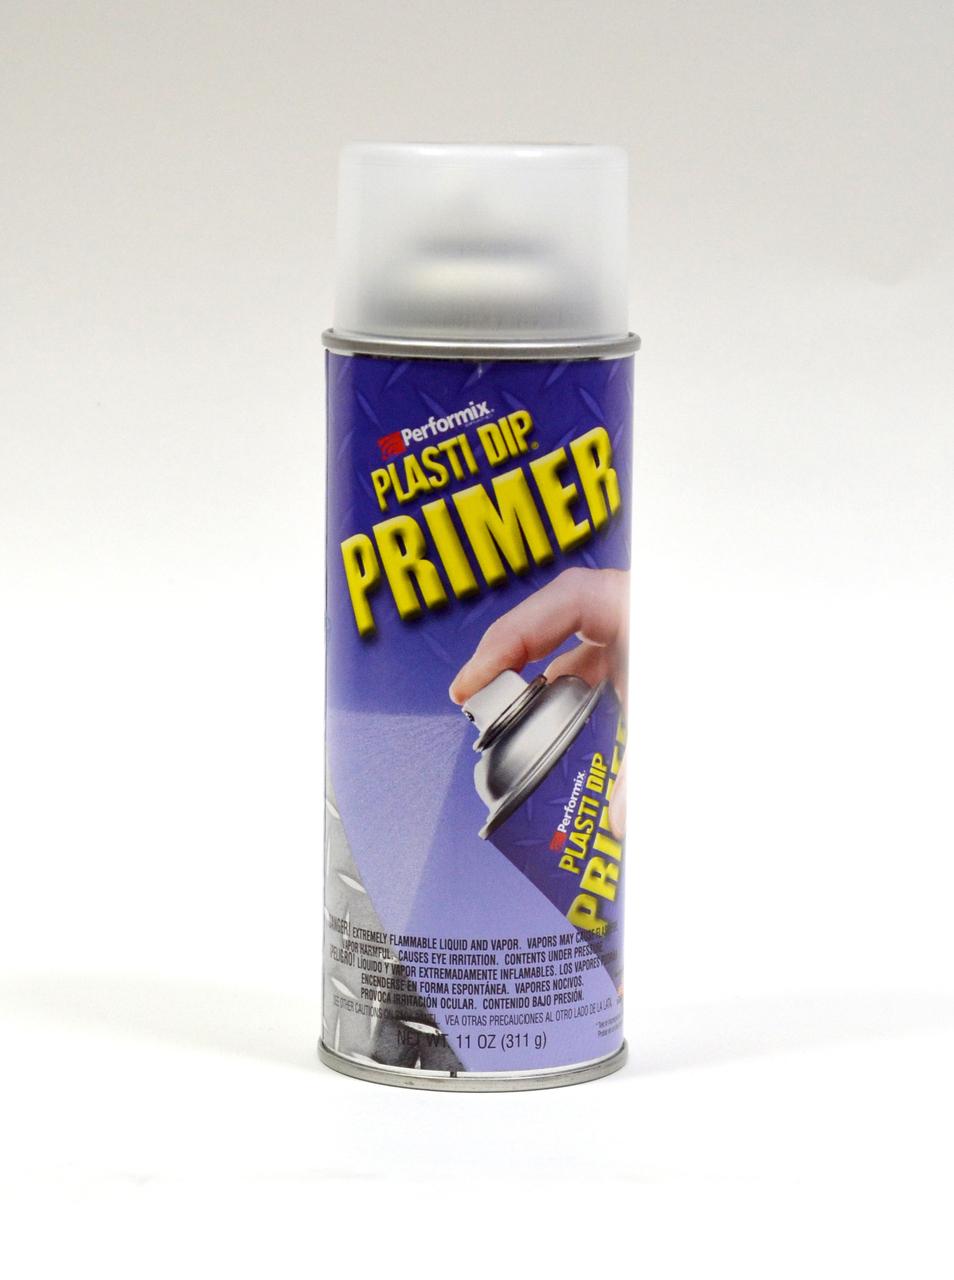 Plasti Dip Primer Aerosol Iplastidip